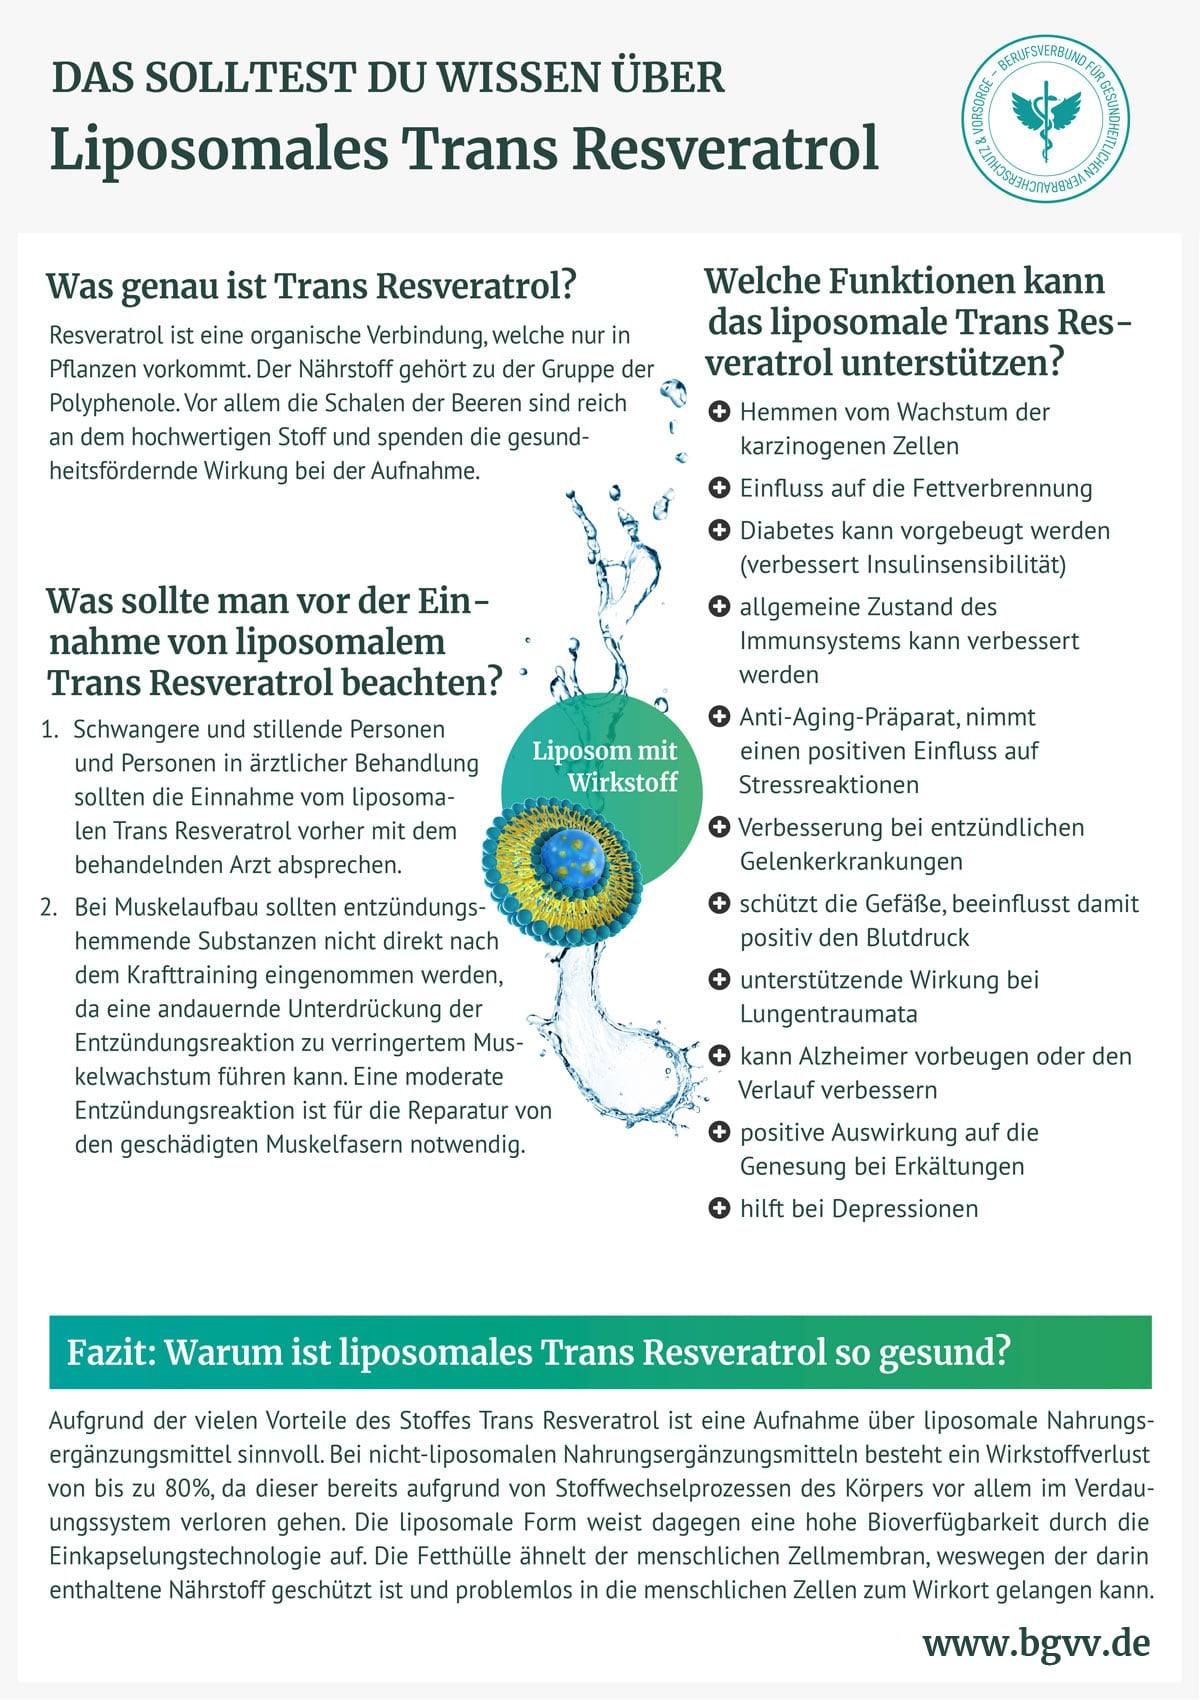 BGVV infografik Liposomales trans Resveratrol